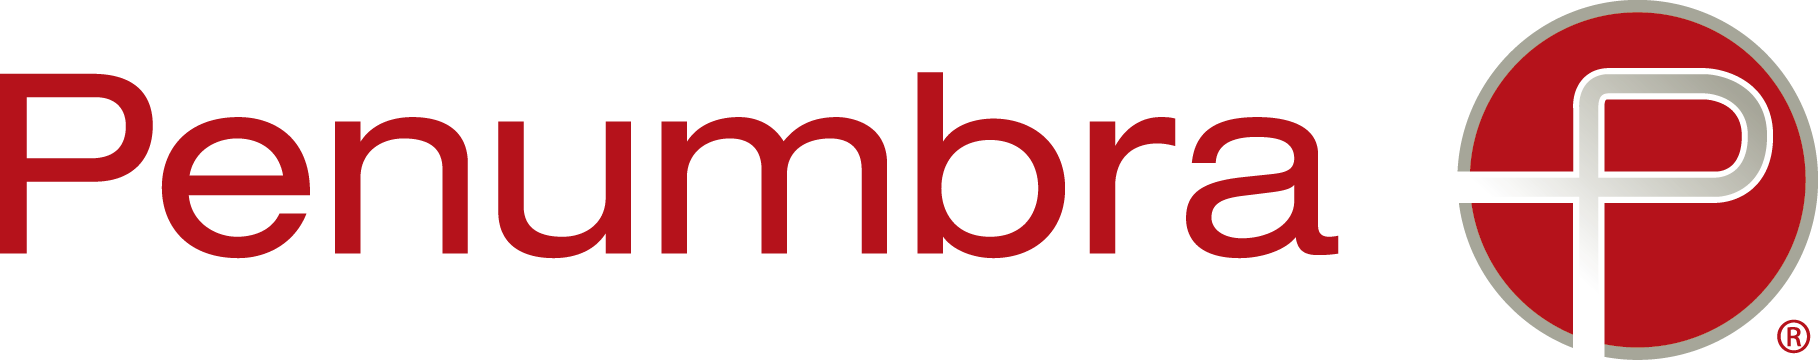 Penumbra_CMYK_1